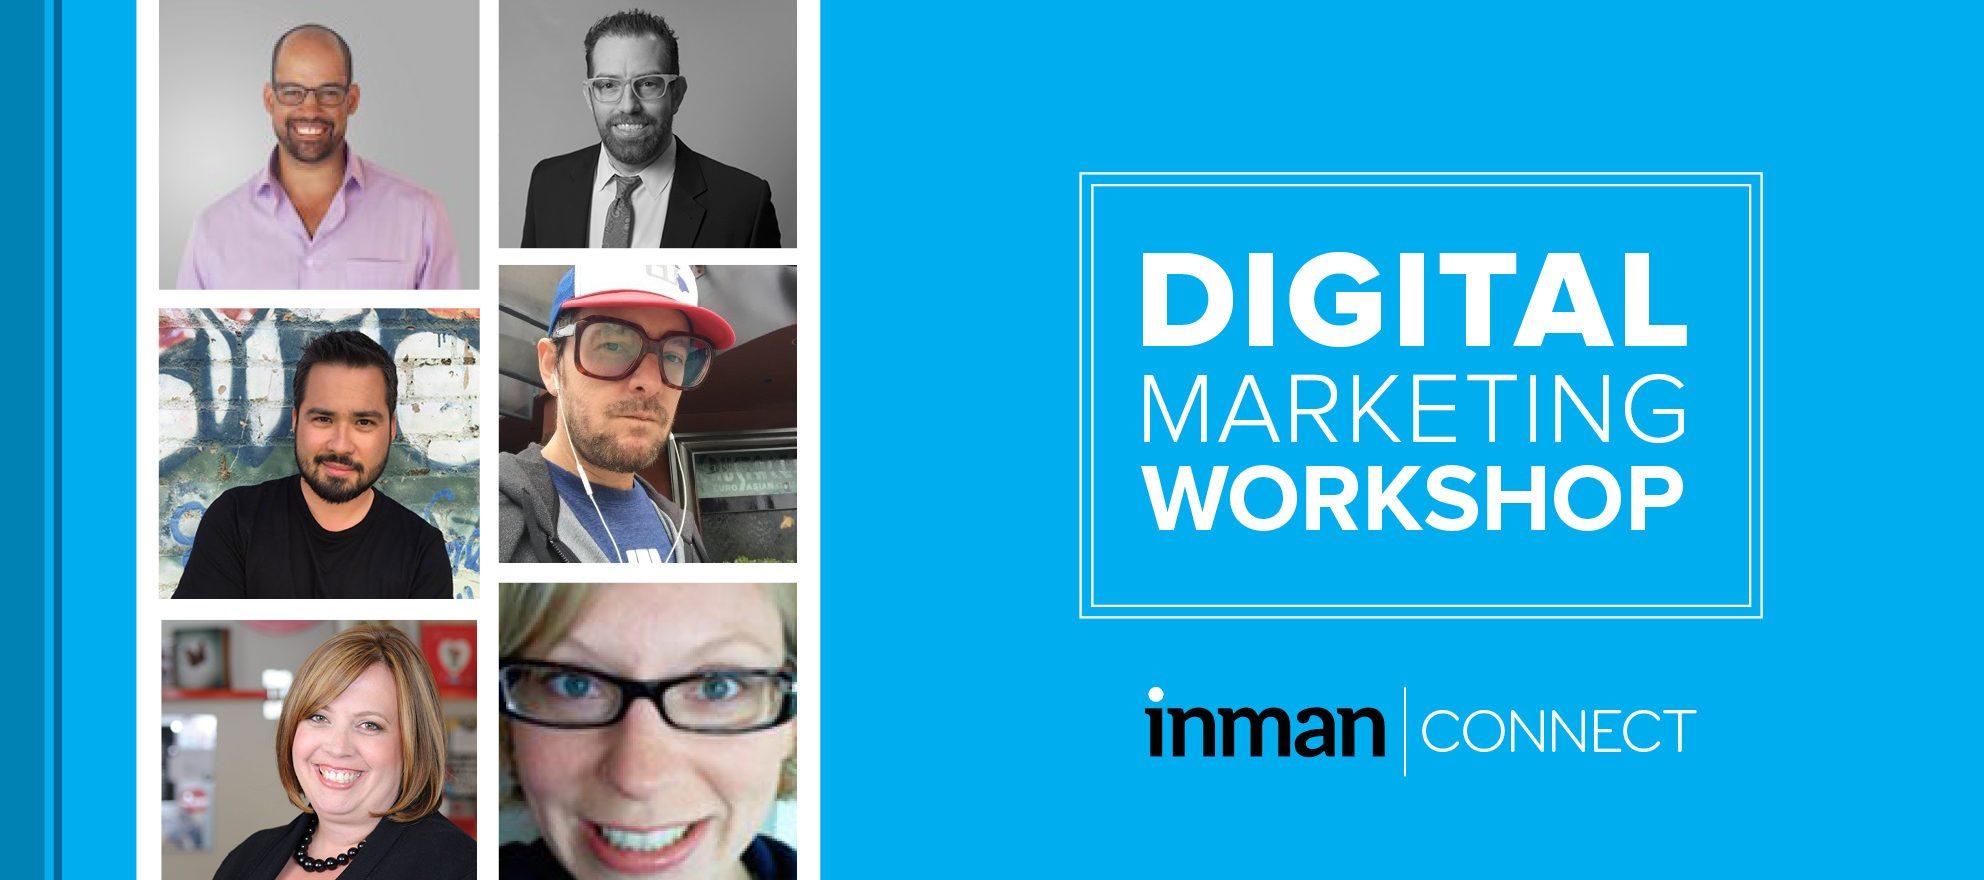 Digital marketing pros dish on best practices